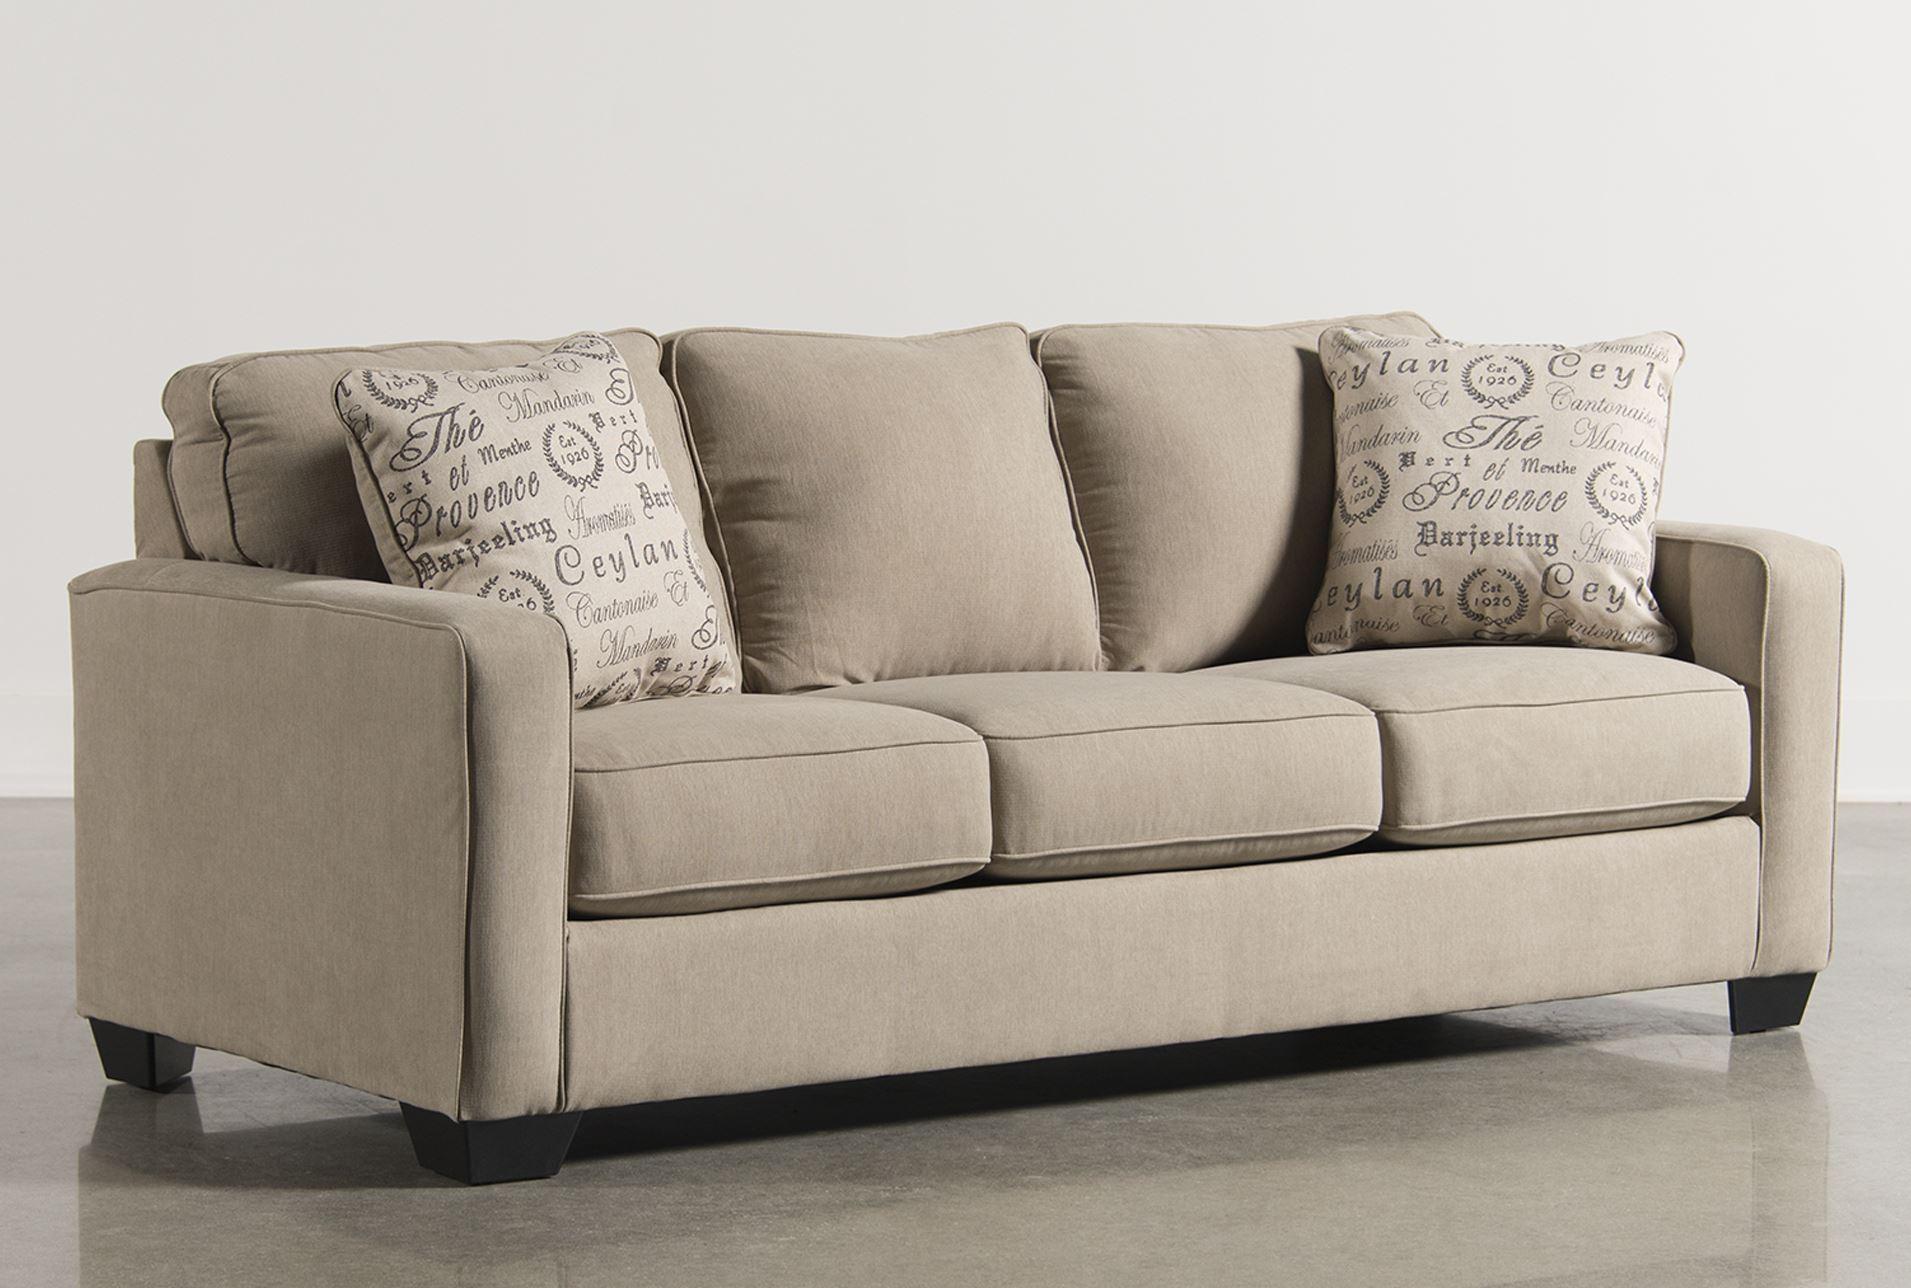 Sofas Center : Elegant Living Spaces Sleeper Sofa About With Austin Sleeper Sofas (Image 14 of 20)